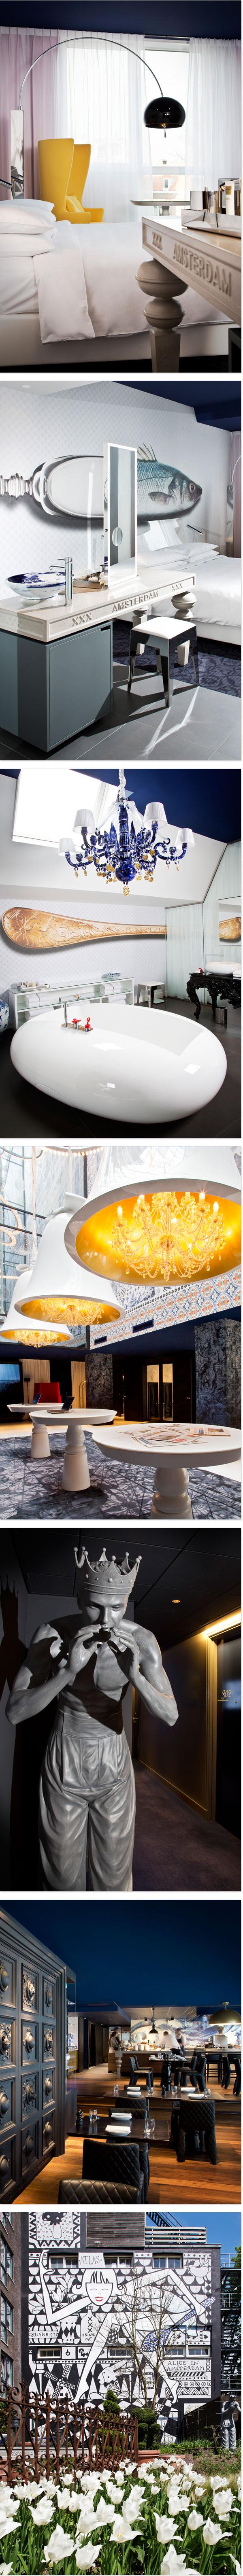 Das Hotel Andaz - Design in Amsterdam